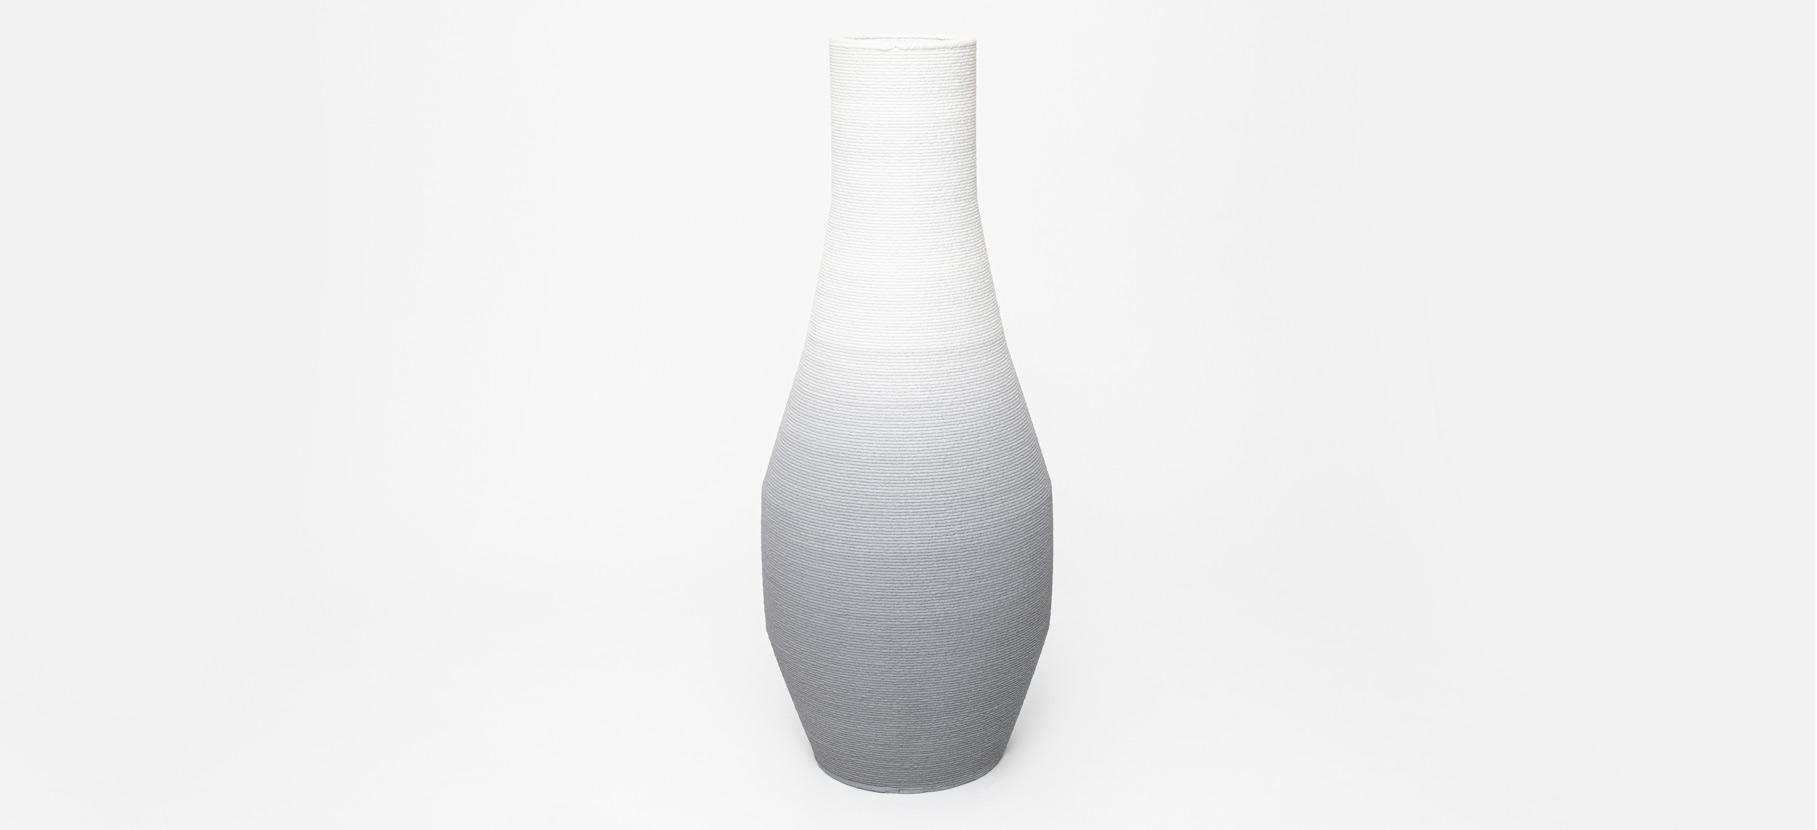 Gradient_Vase_Large_2